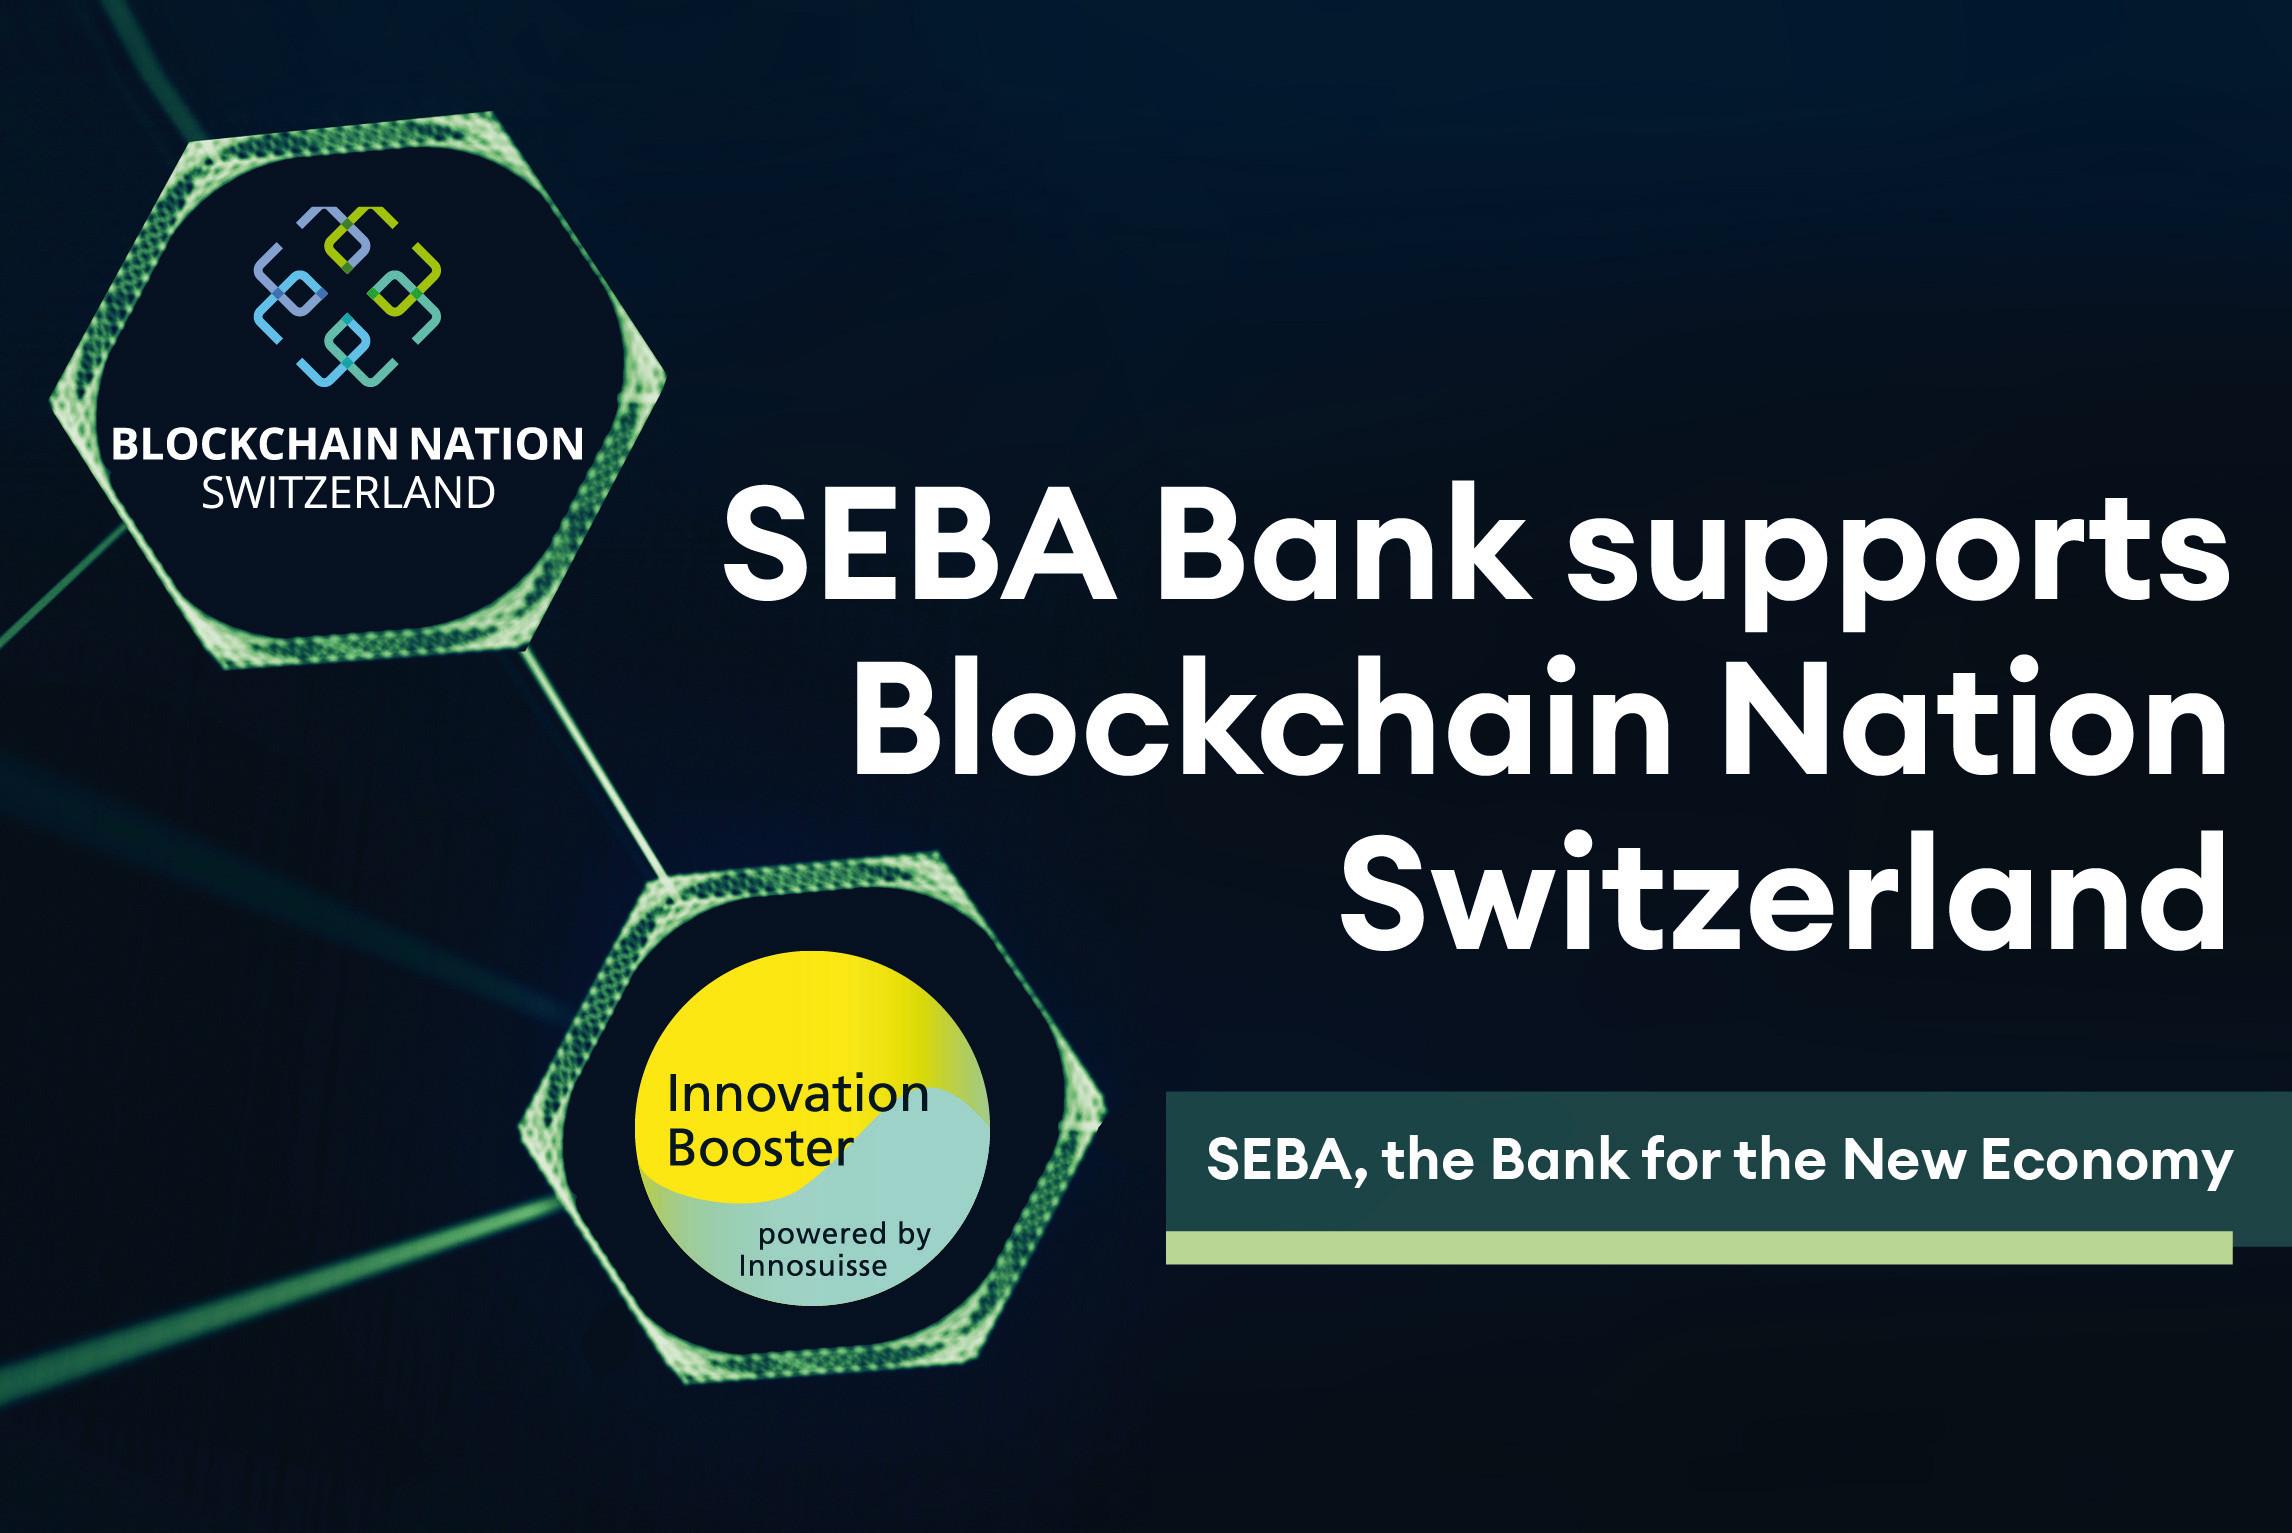 SEBA Bank supports Blockchain Nation Switzerland